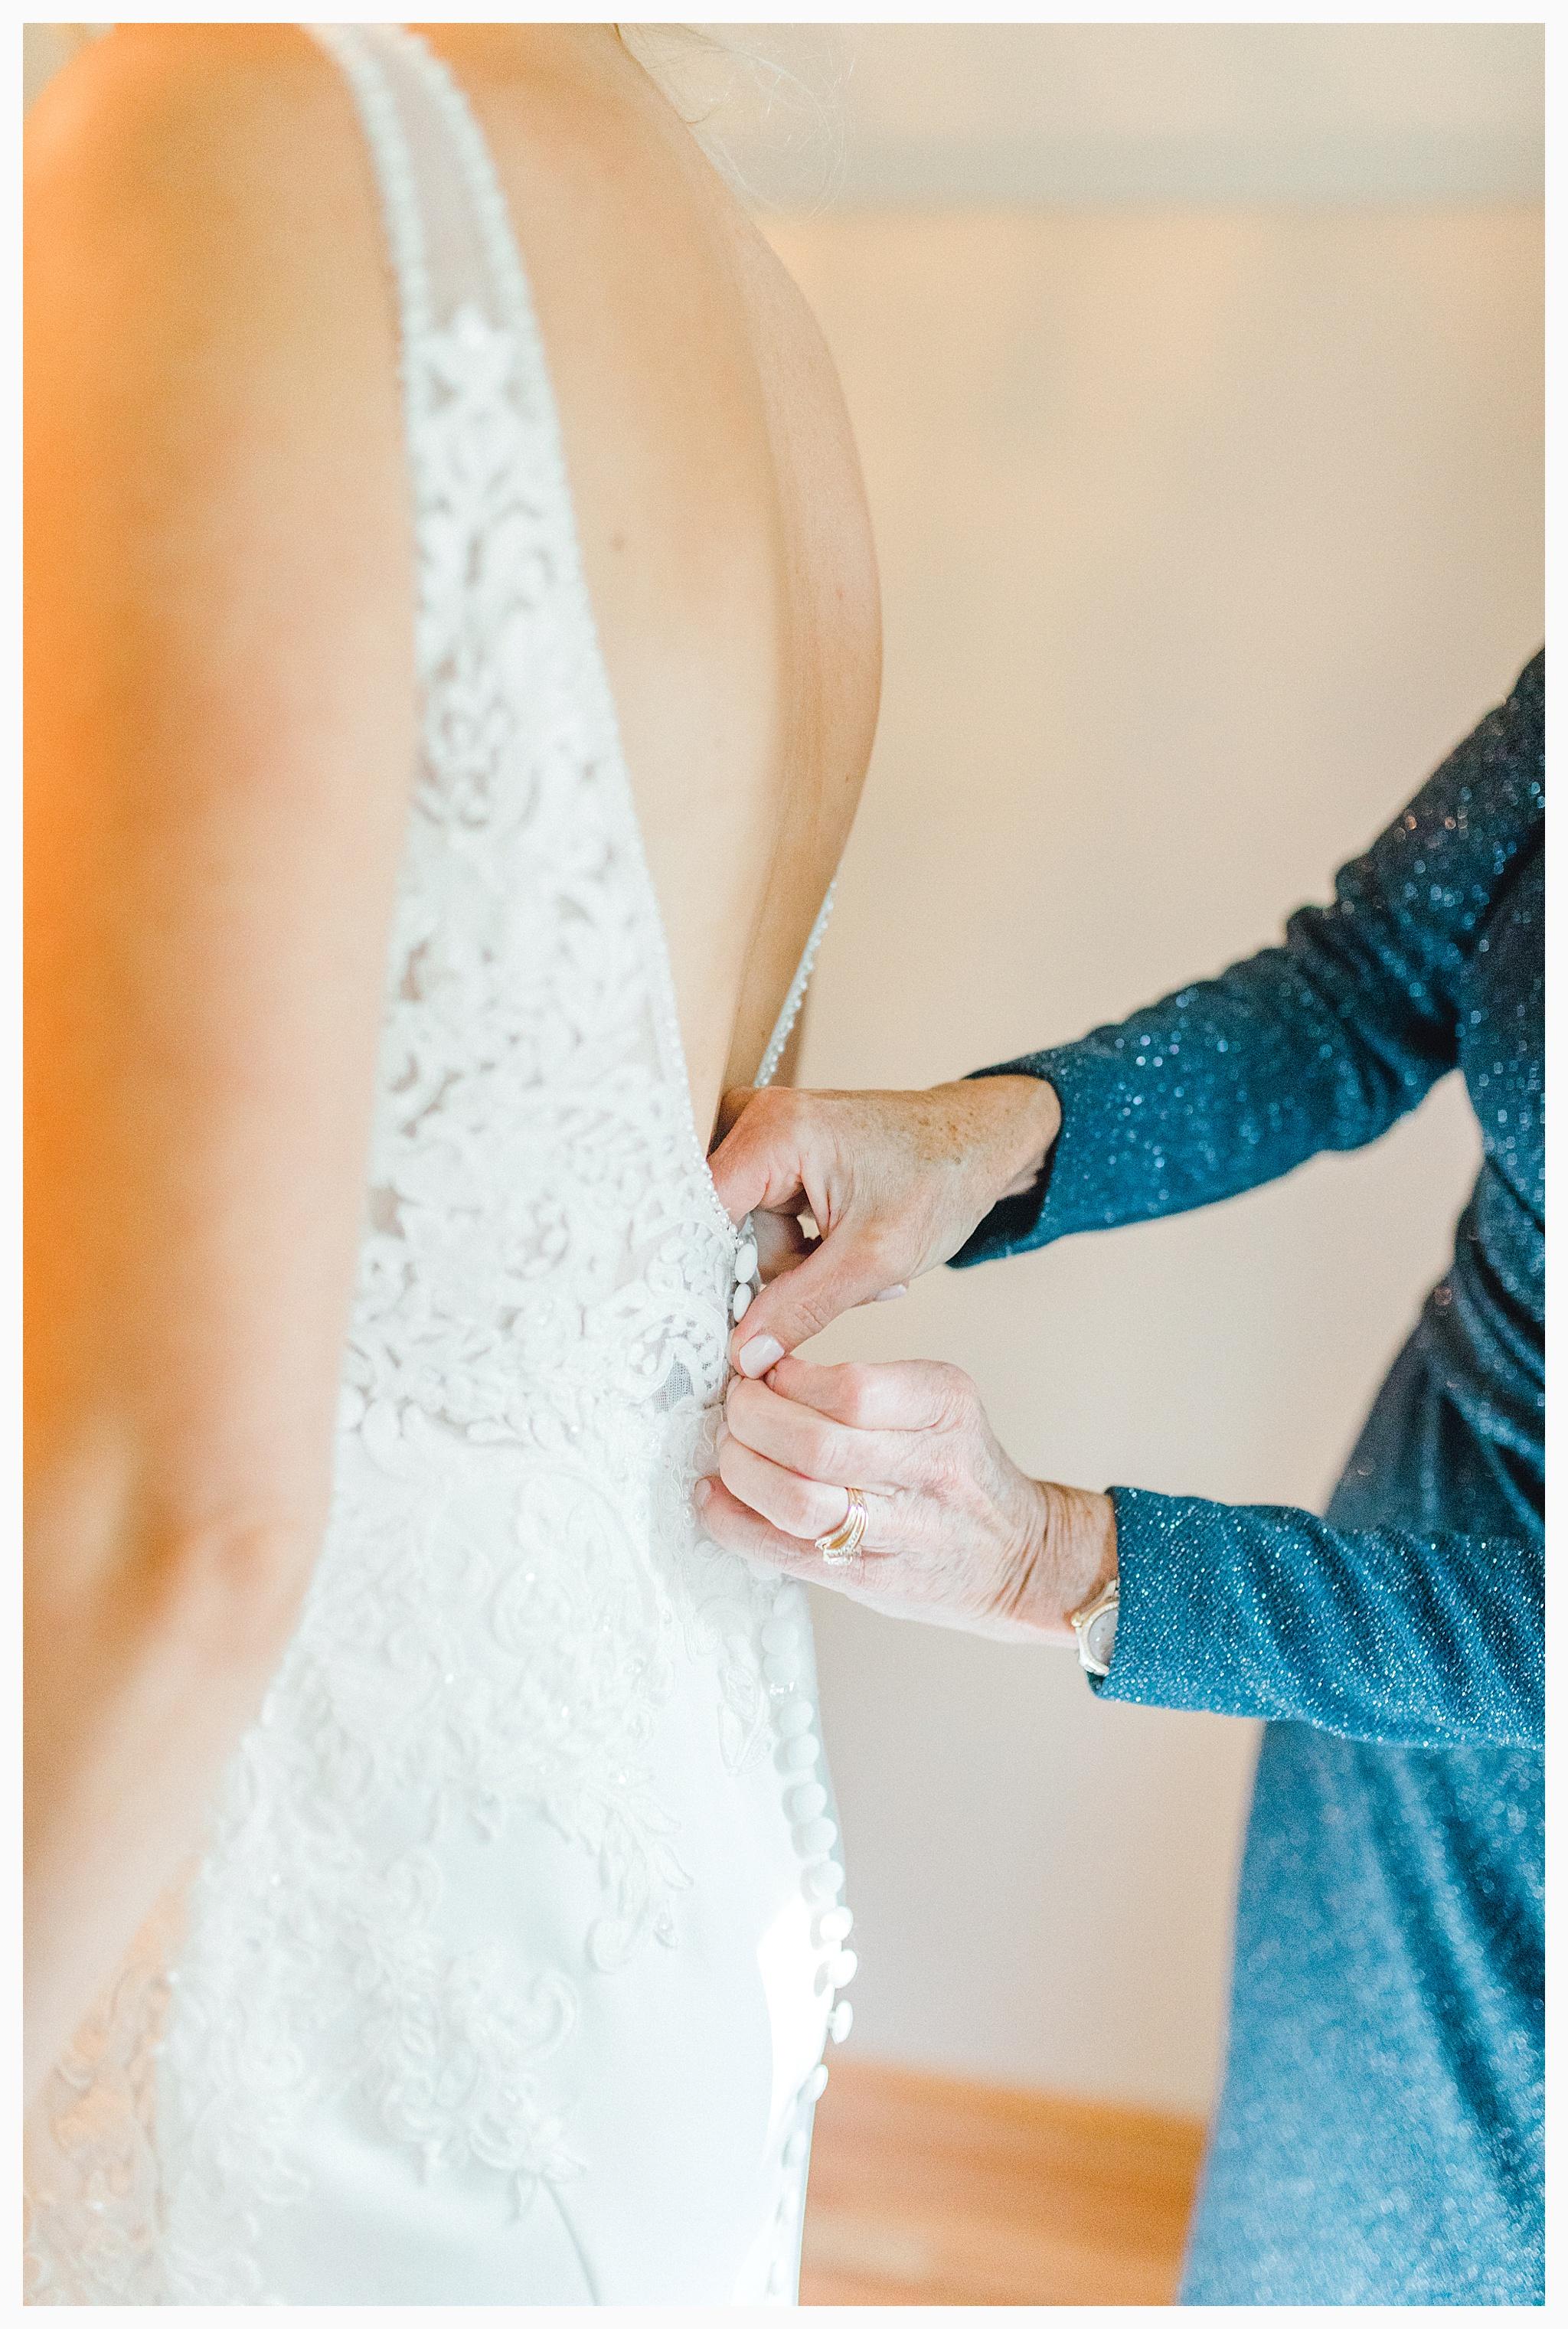 Emma Rose Company Light and Airy Wedding Photographer, Beautiful fall wedding at Rock Creek Gardens Venue in Puyallup, Washington._0013.jpg